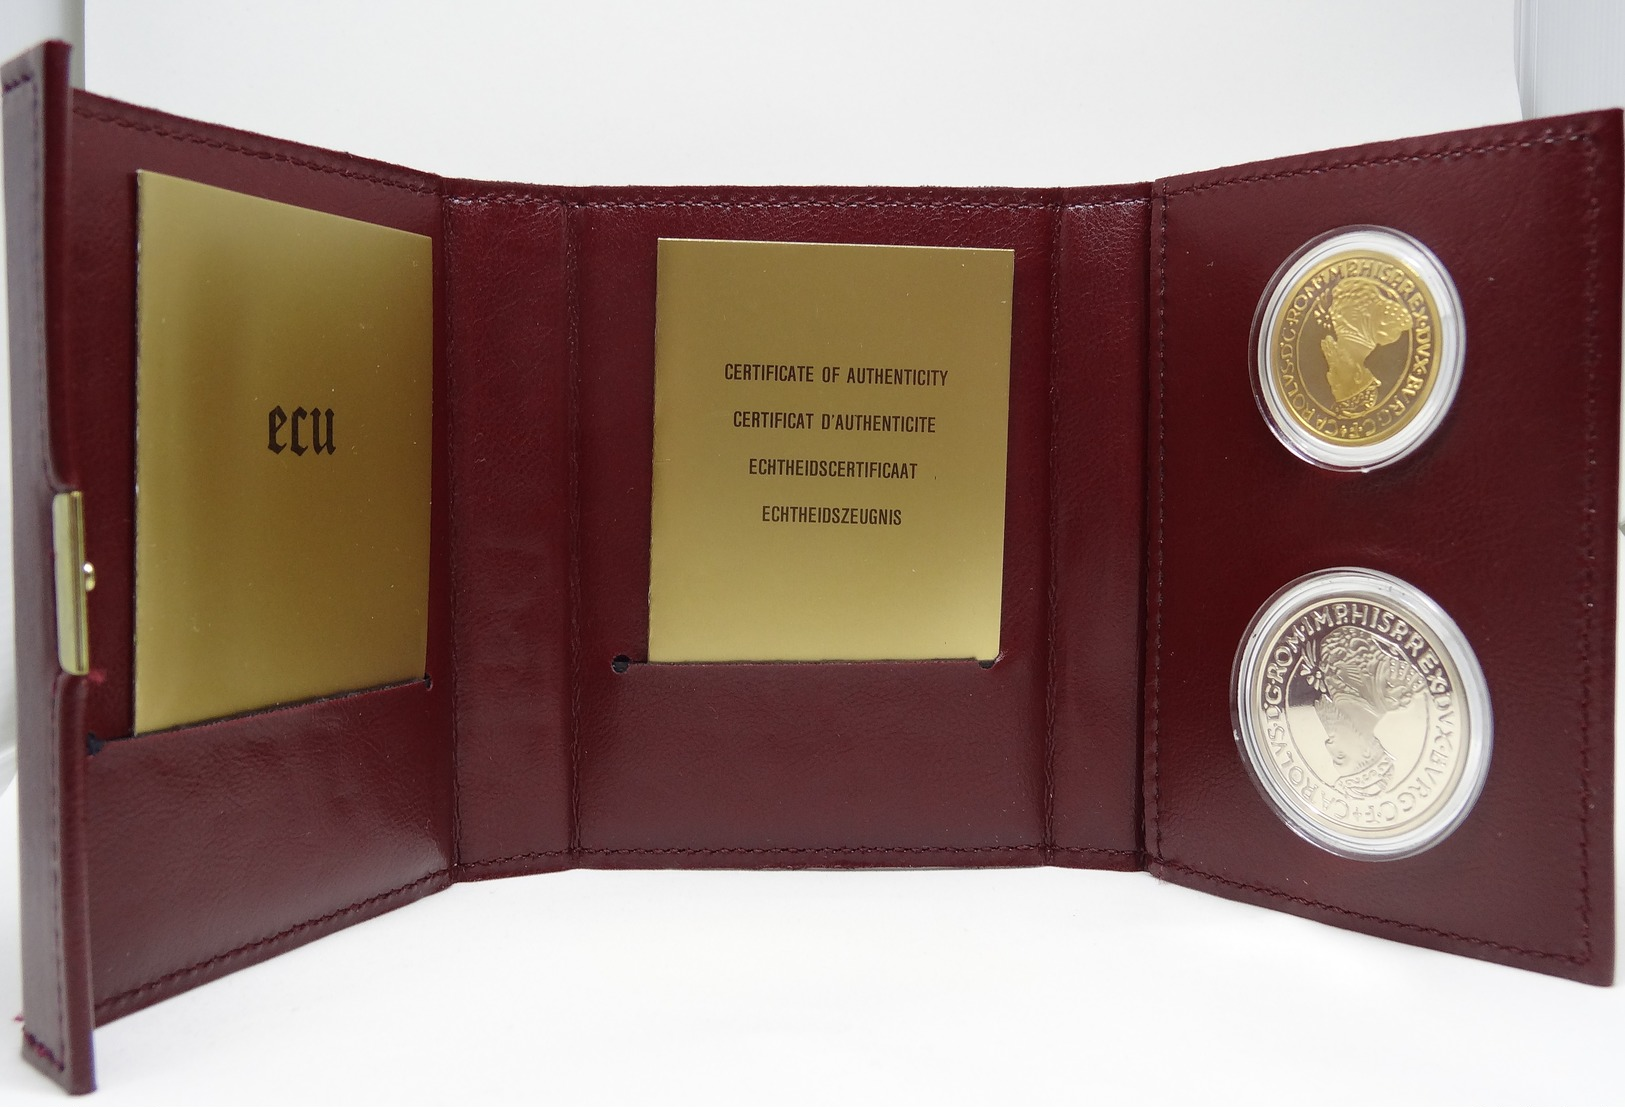 1988 Belgian ECU Coffret En Cuir - 50 ECU Or & 5 ECU Argent - Belgique